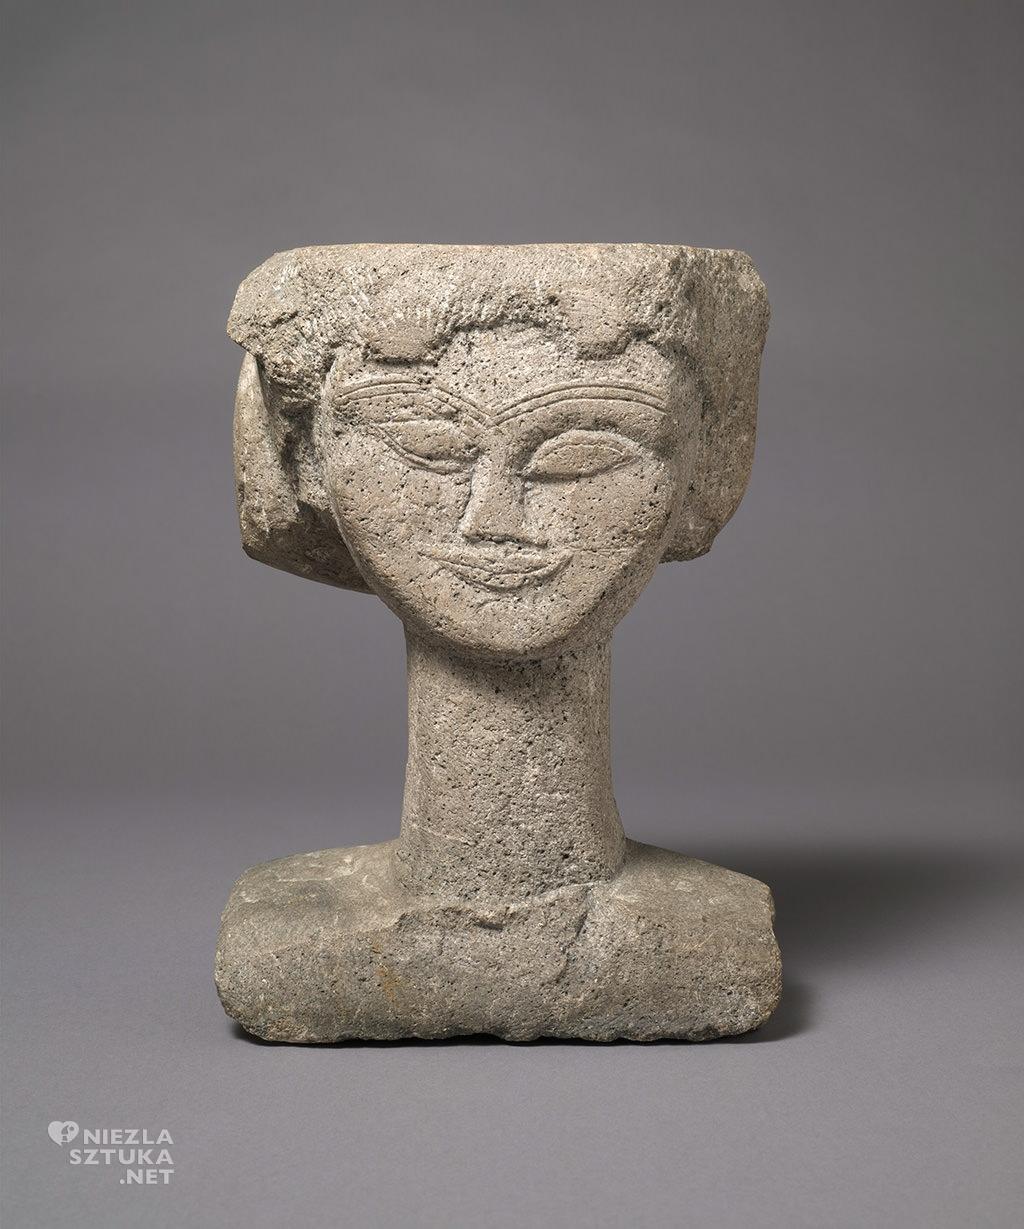 Amedeo Modigliani, Głowa, rzeźba, sztuka włoska, sztuka nowoczesna, Ecole de Paris, Niezła Sztuka